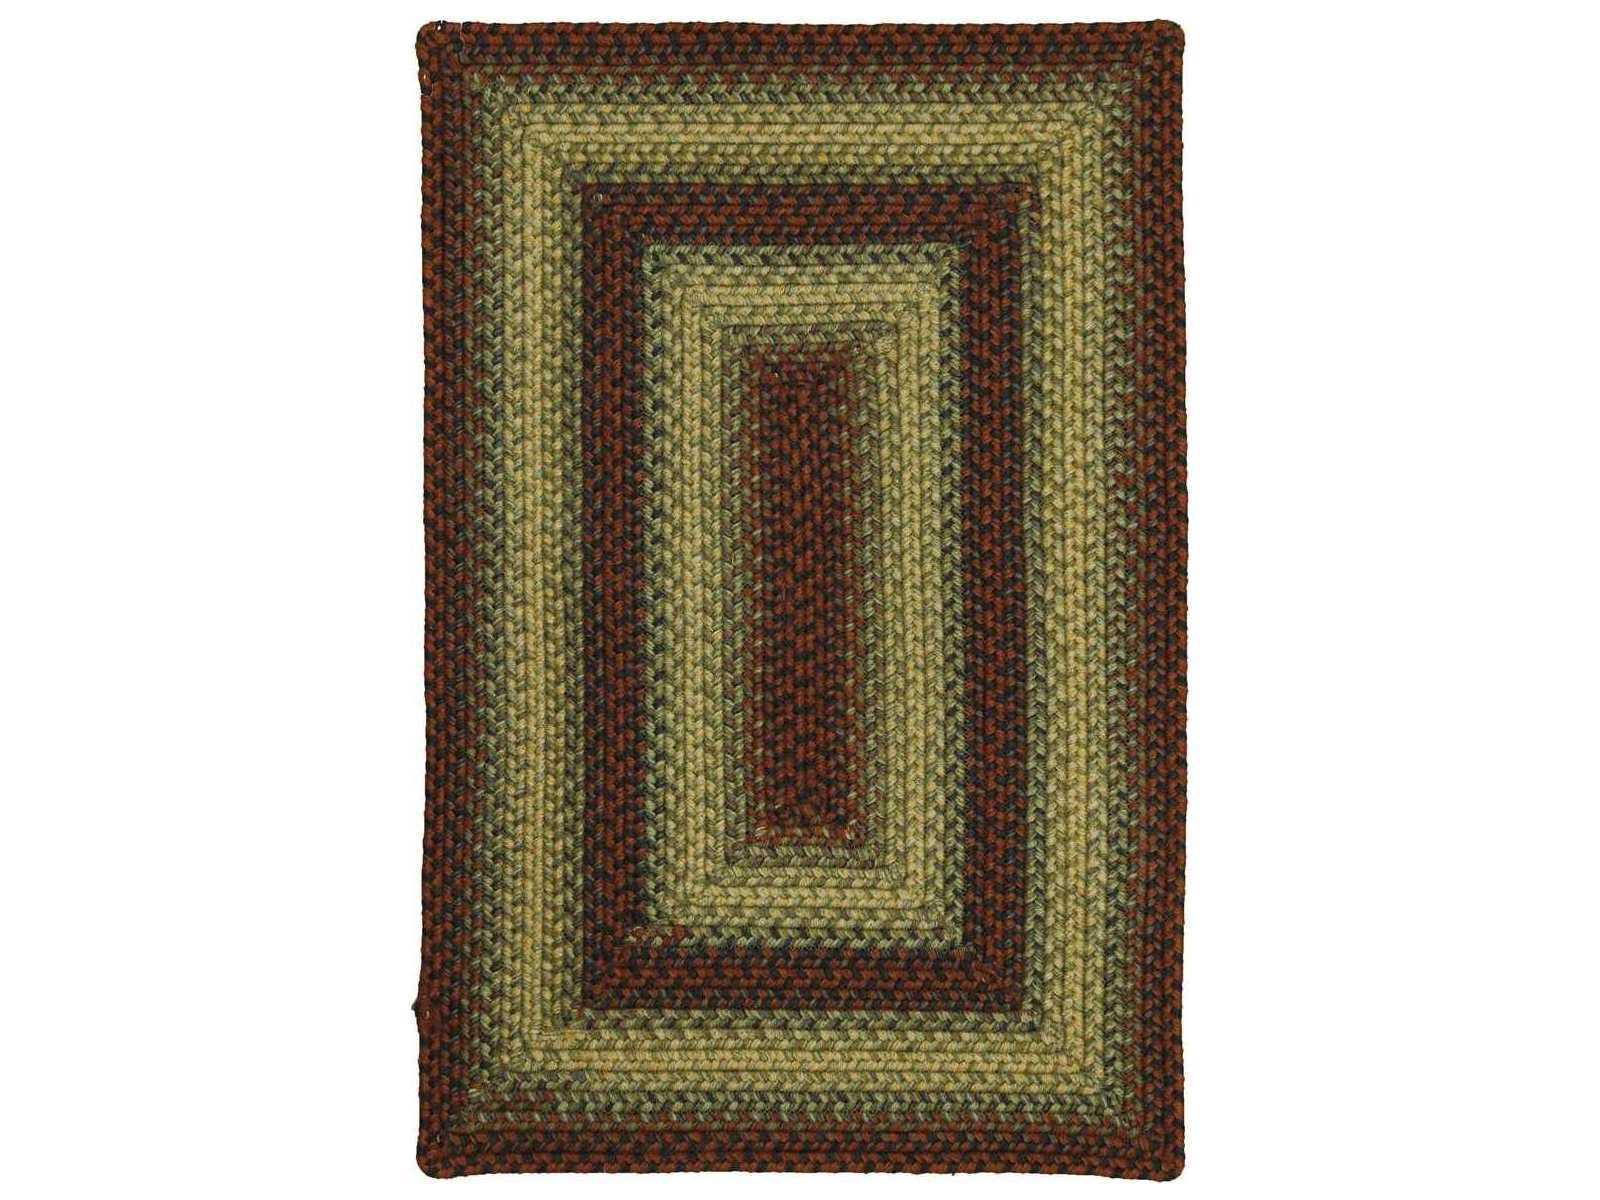 Homespice Decor Ultra Wool Braided Flagstaff Red